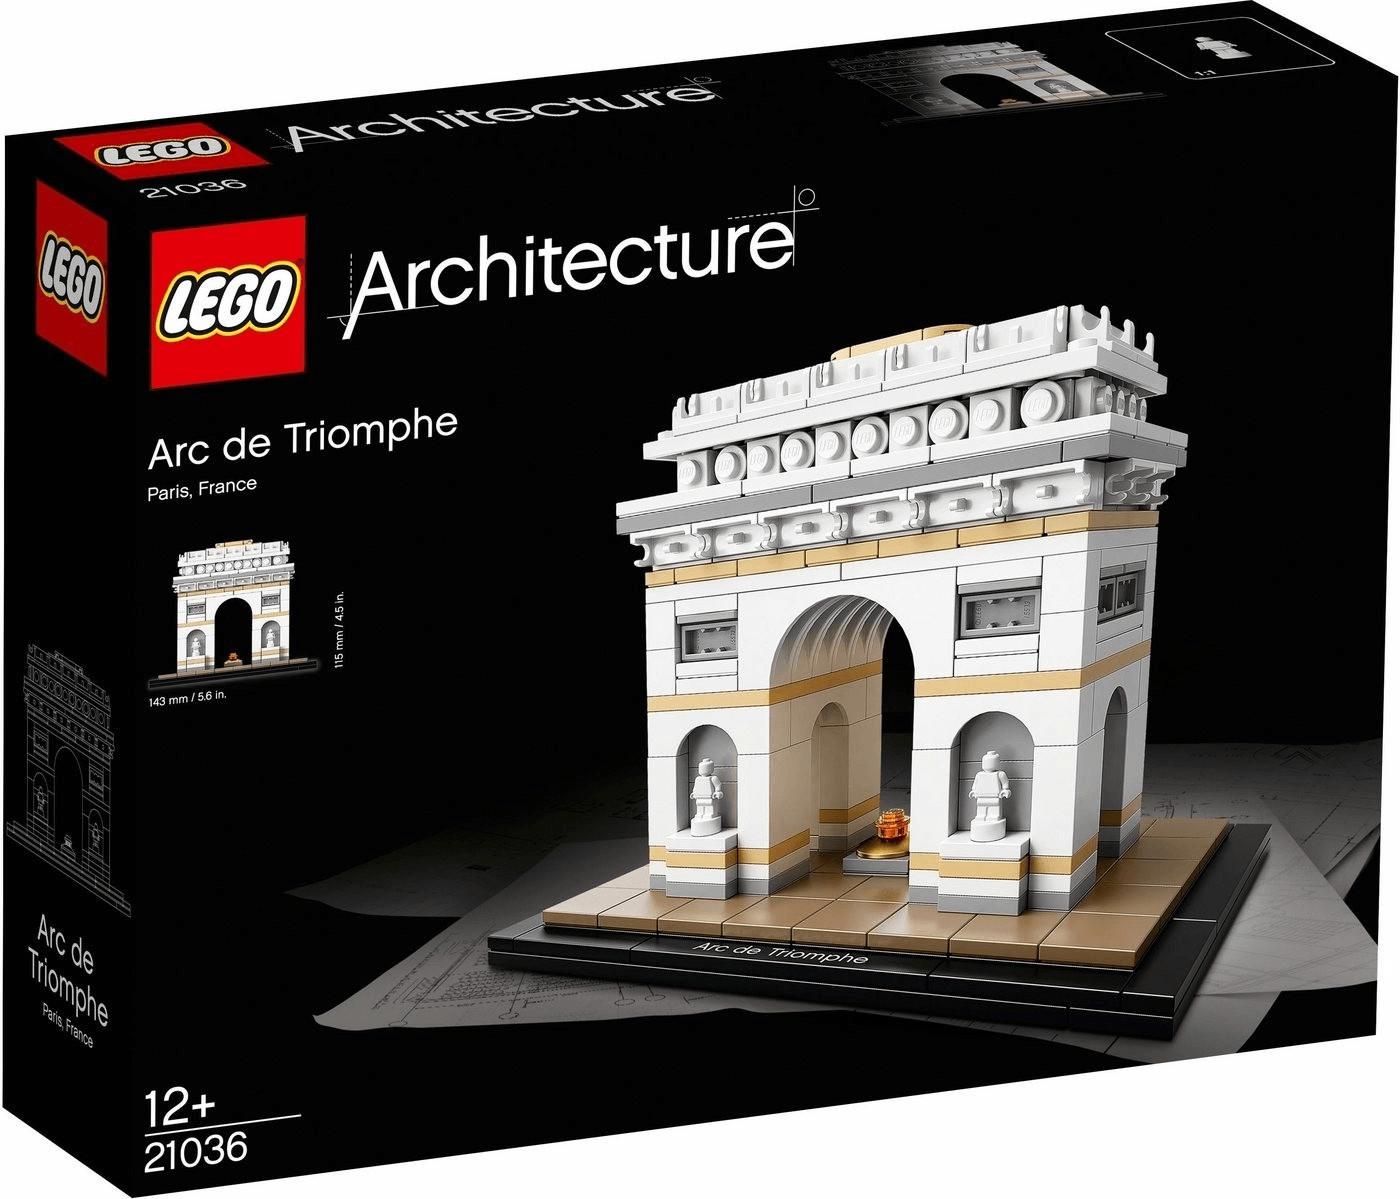 LEGO Architecture - Arc de Triomphe (21036)